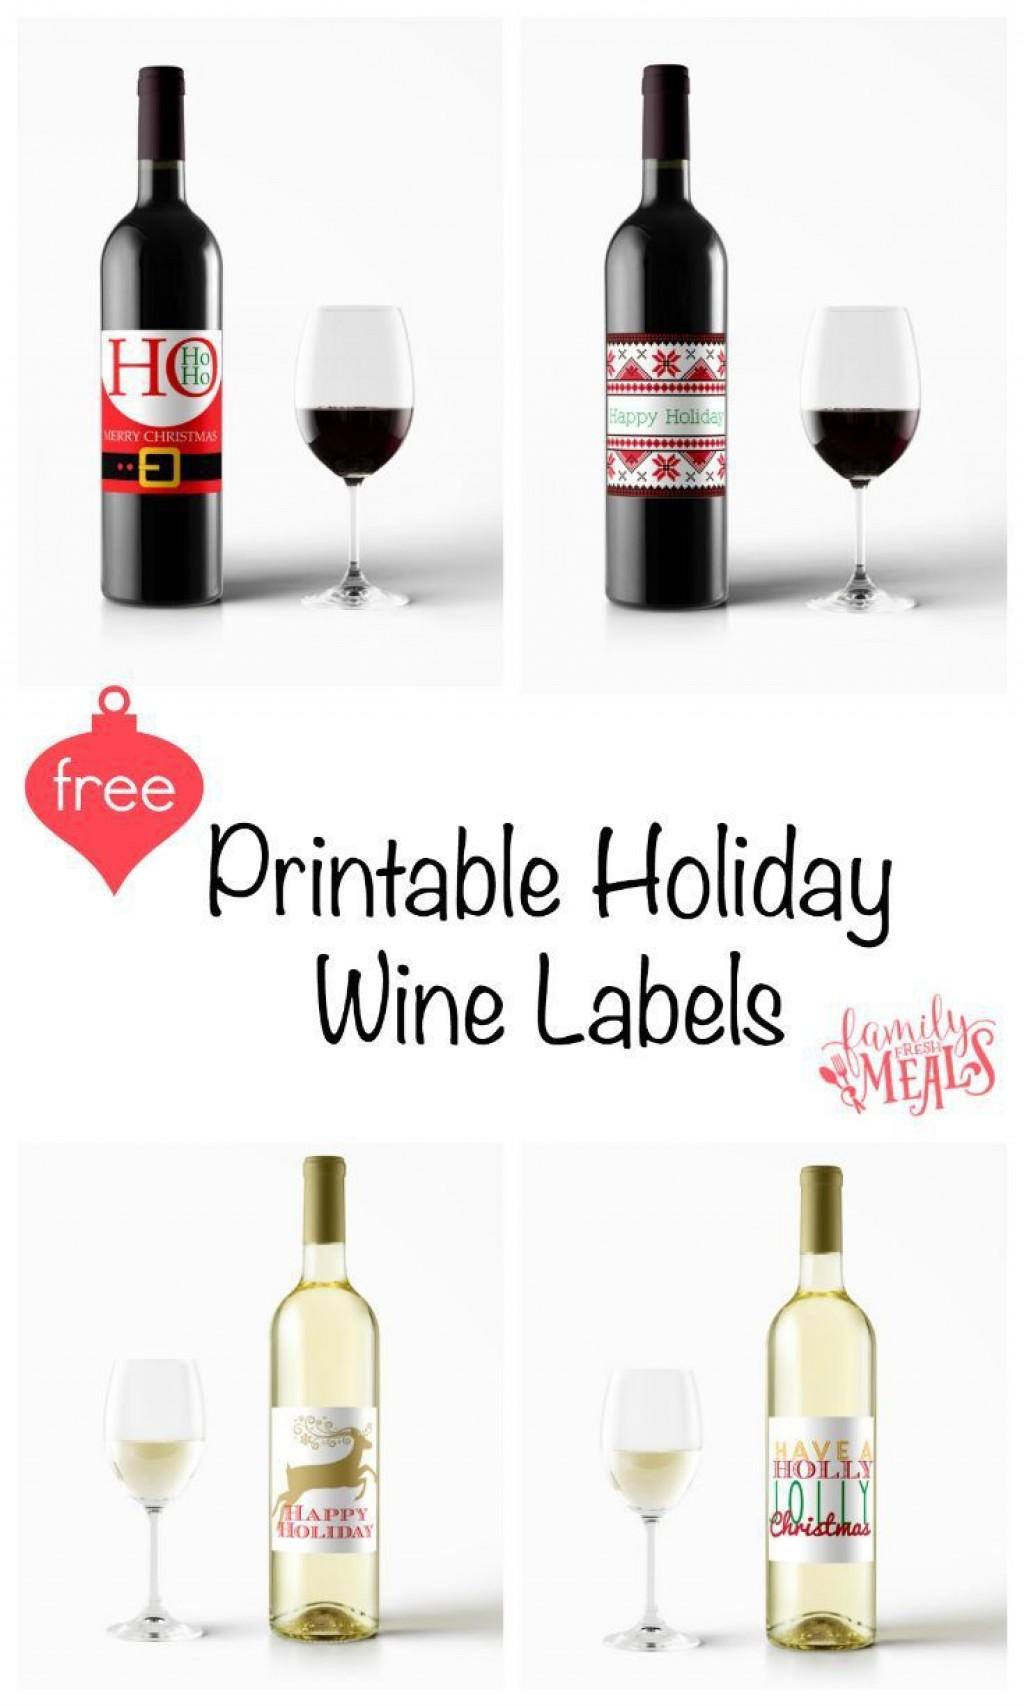 004 Incredible Free Wine Bottle Label Template Sample  Mini PrintableLarge